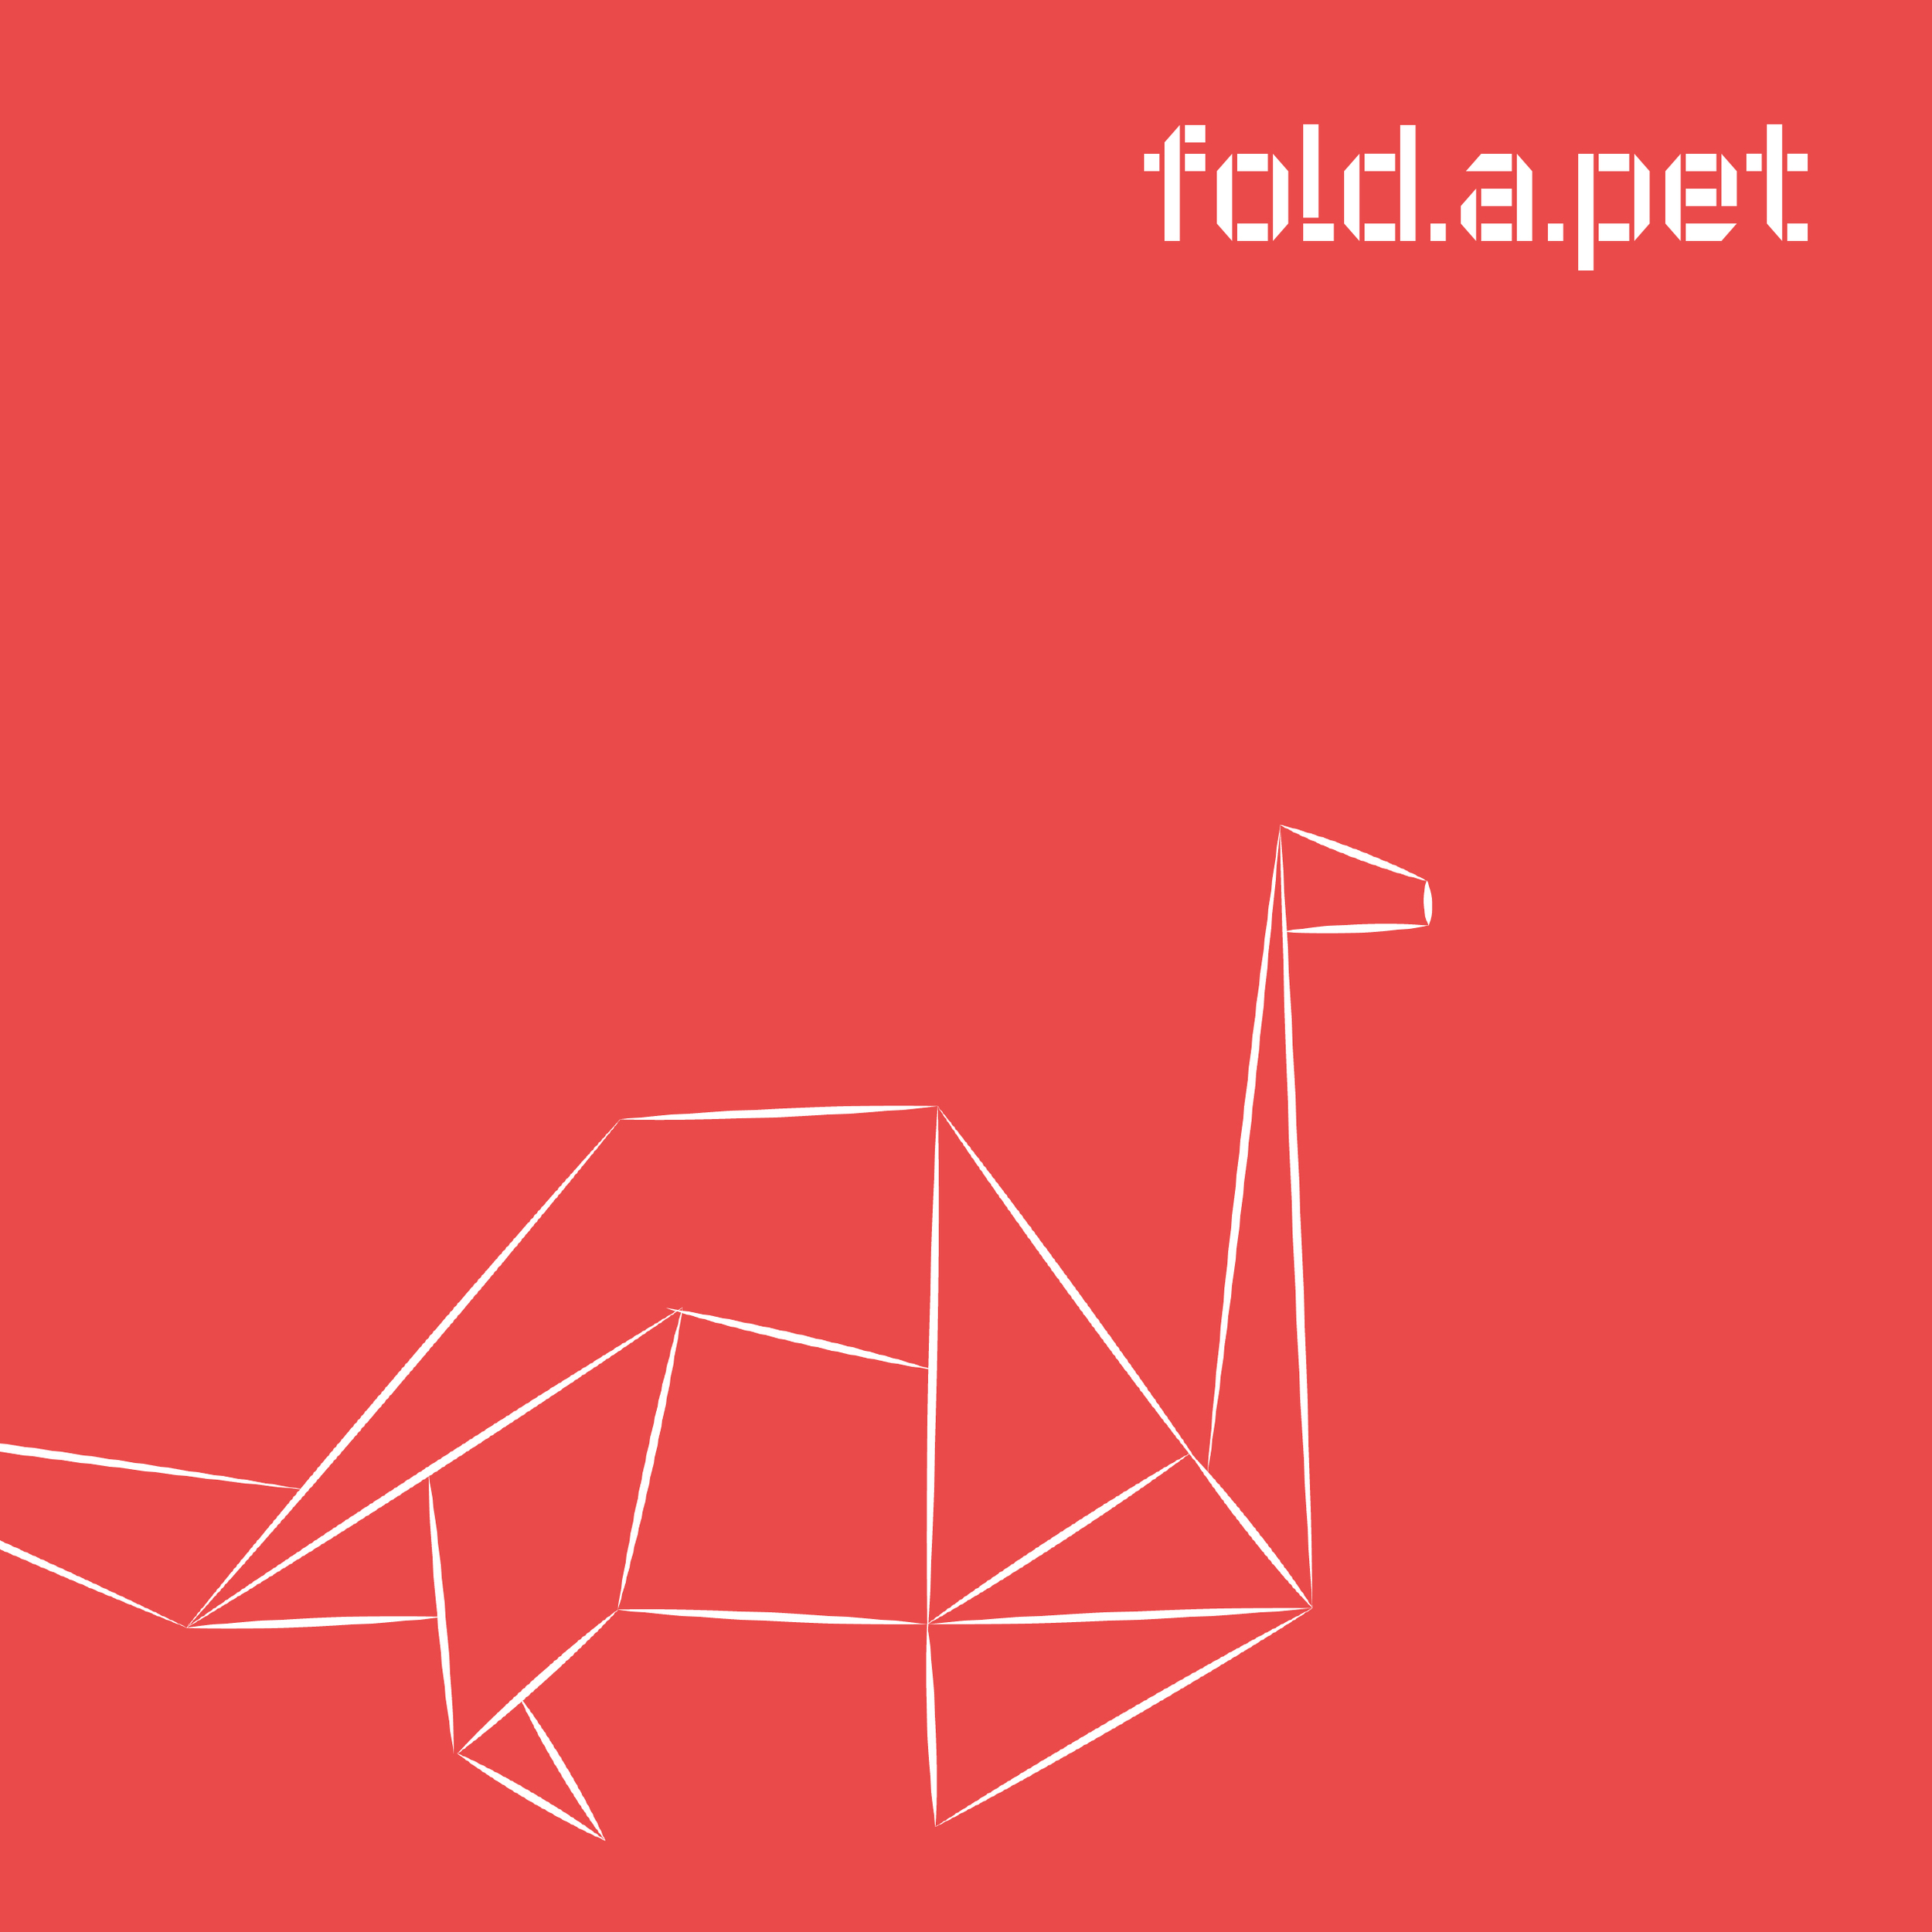 fold.a.pet.